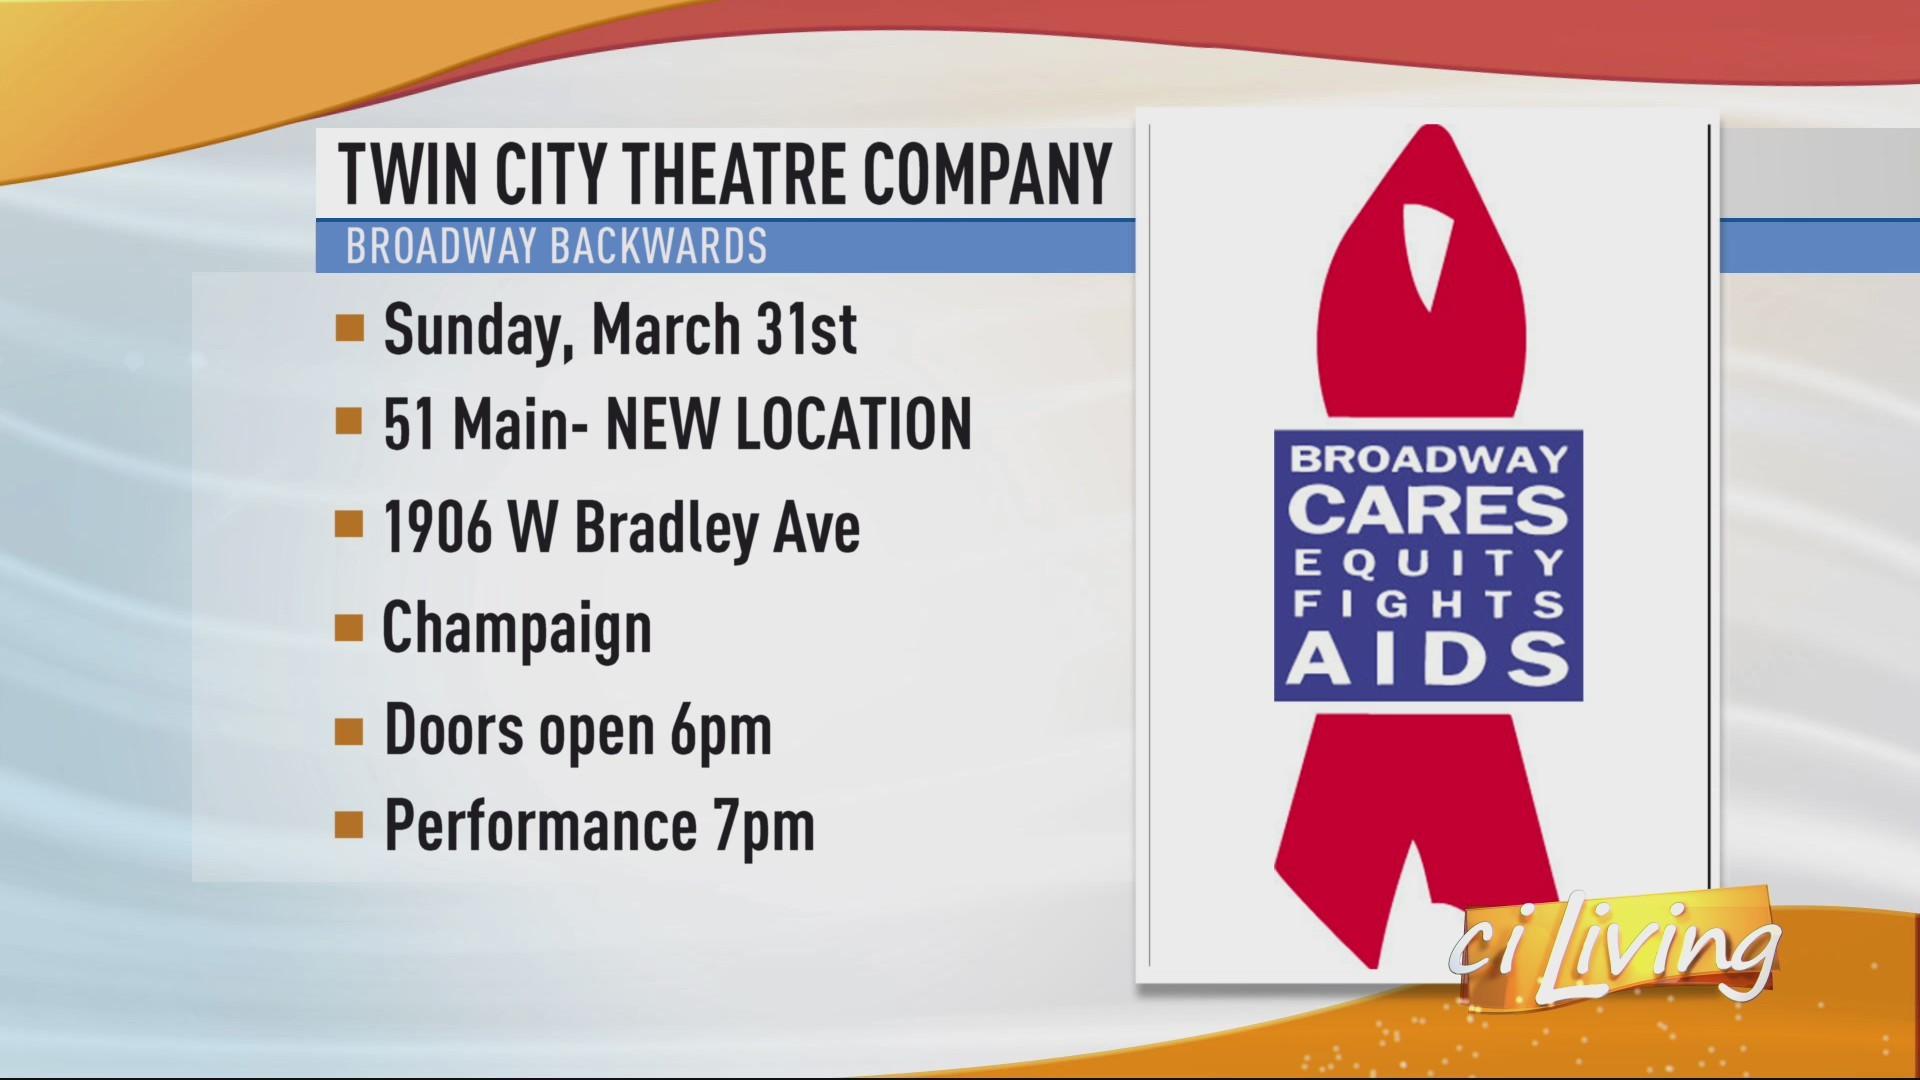 Twin City Theatre Company Broadway Backwards